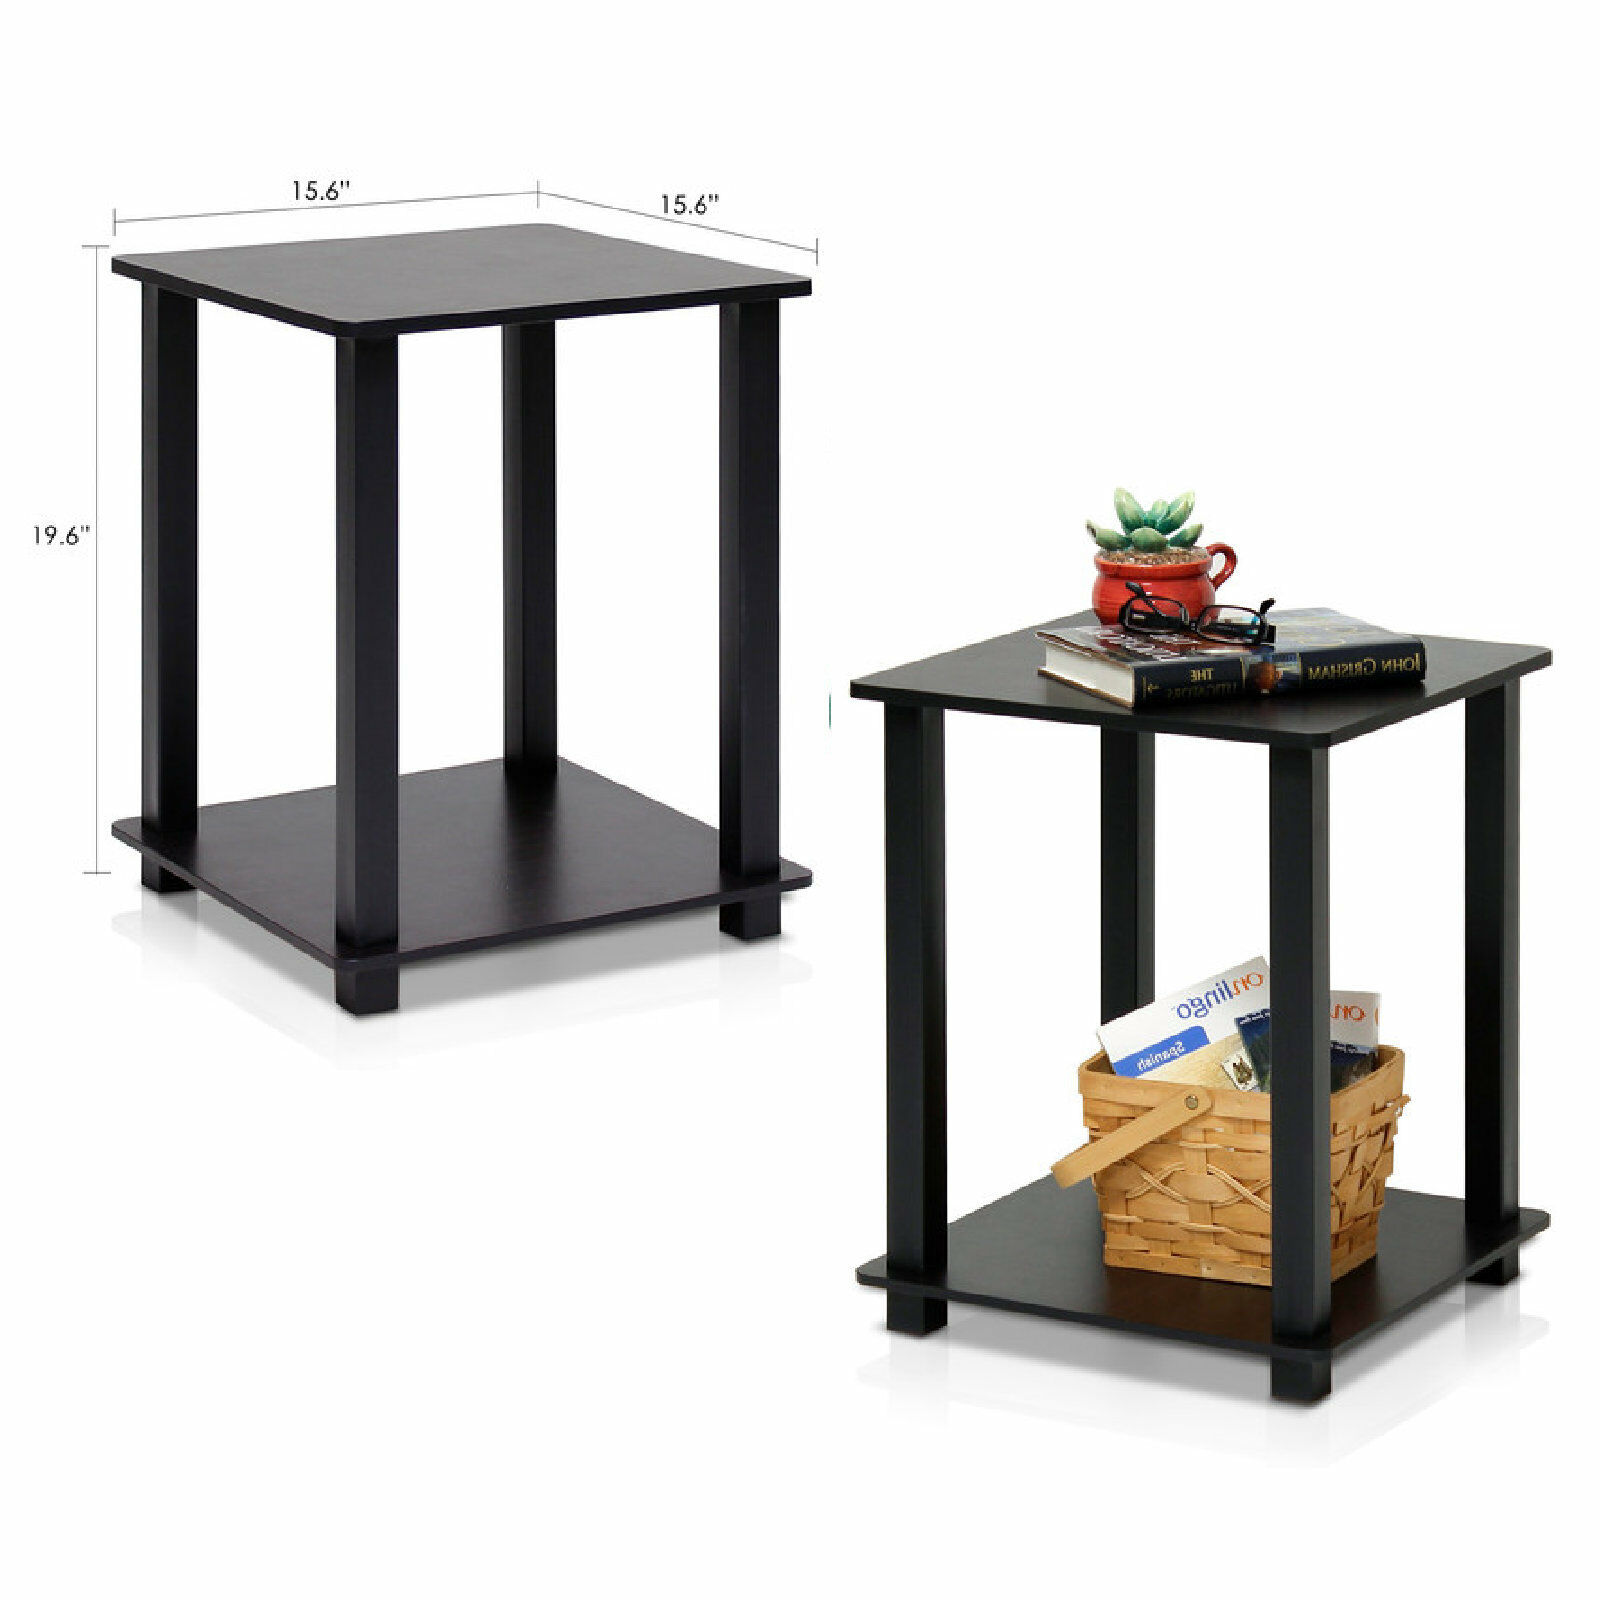 End Table Set 2 Small Side Tables Storage Shelf Wood Living Room ...